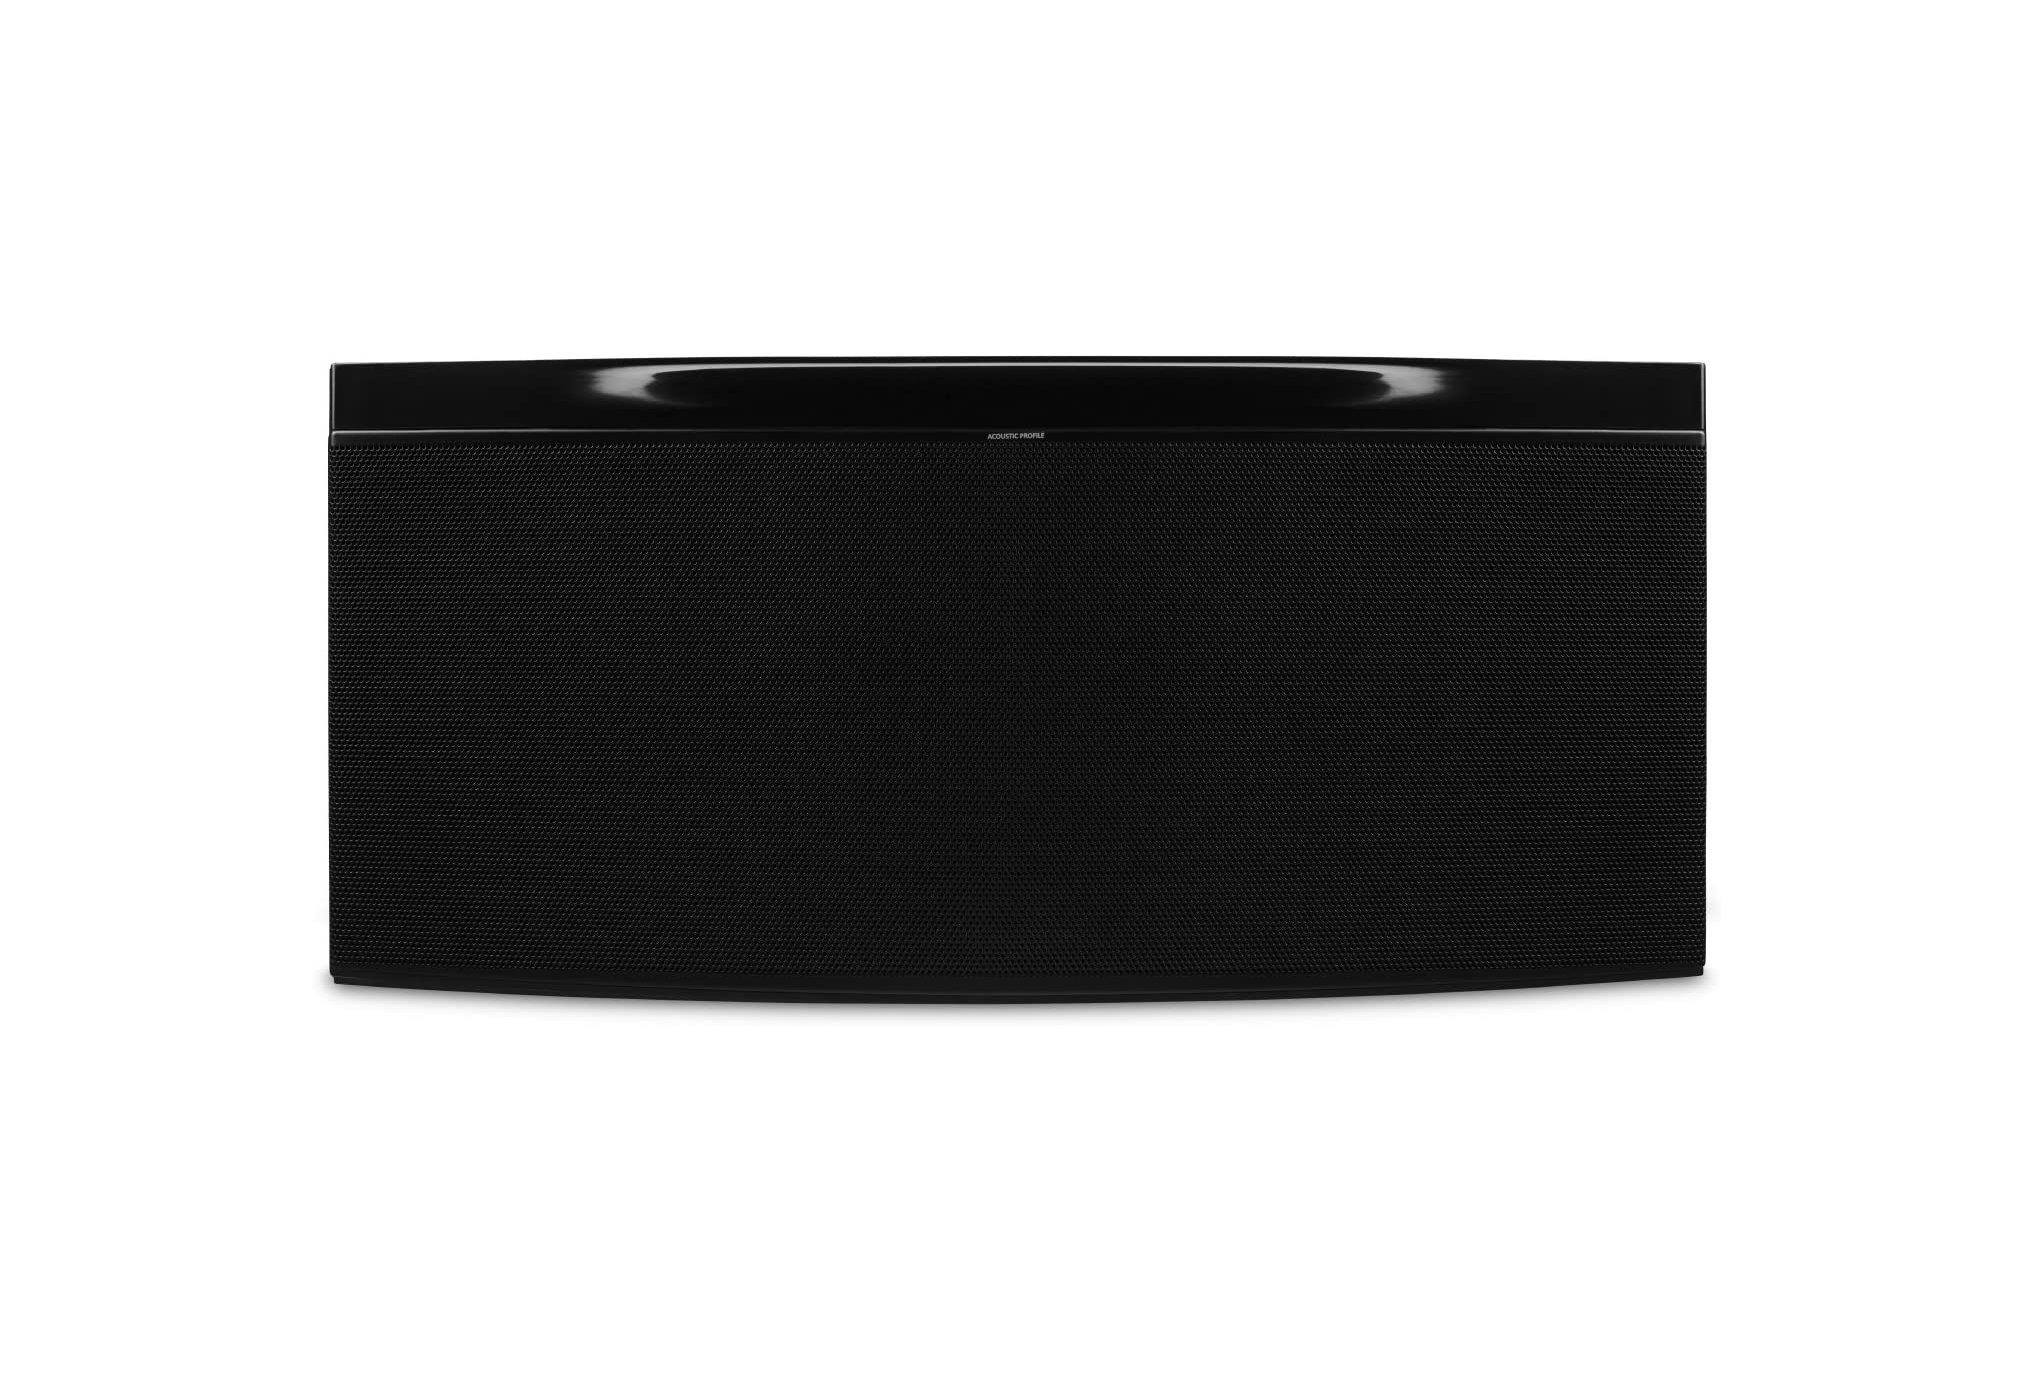 Monster StreamCast S3 Enceinte Bluetooth